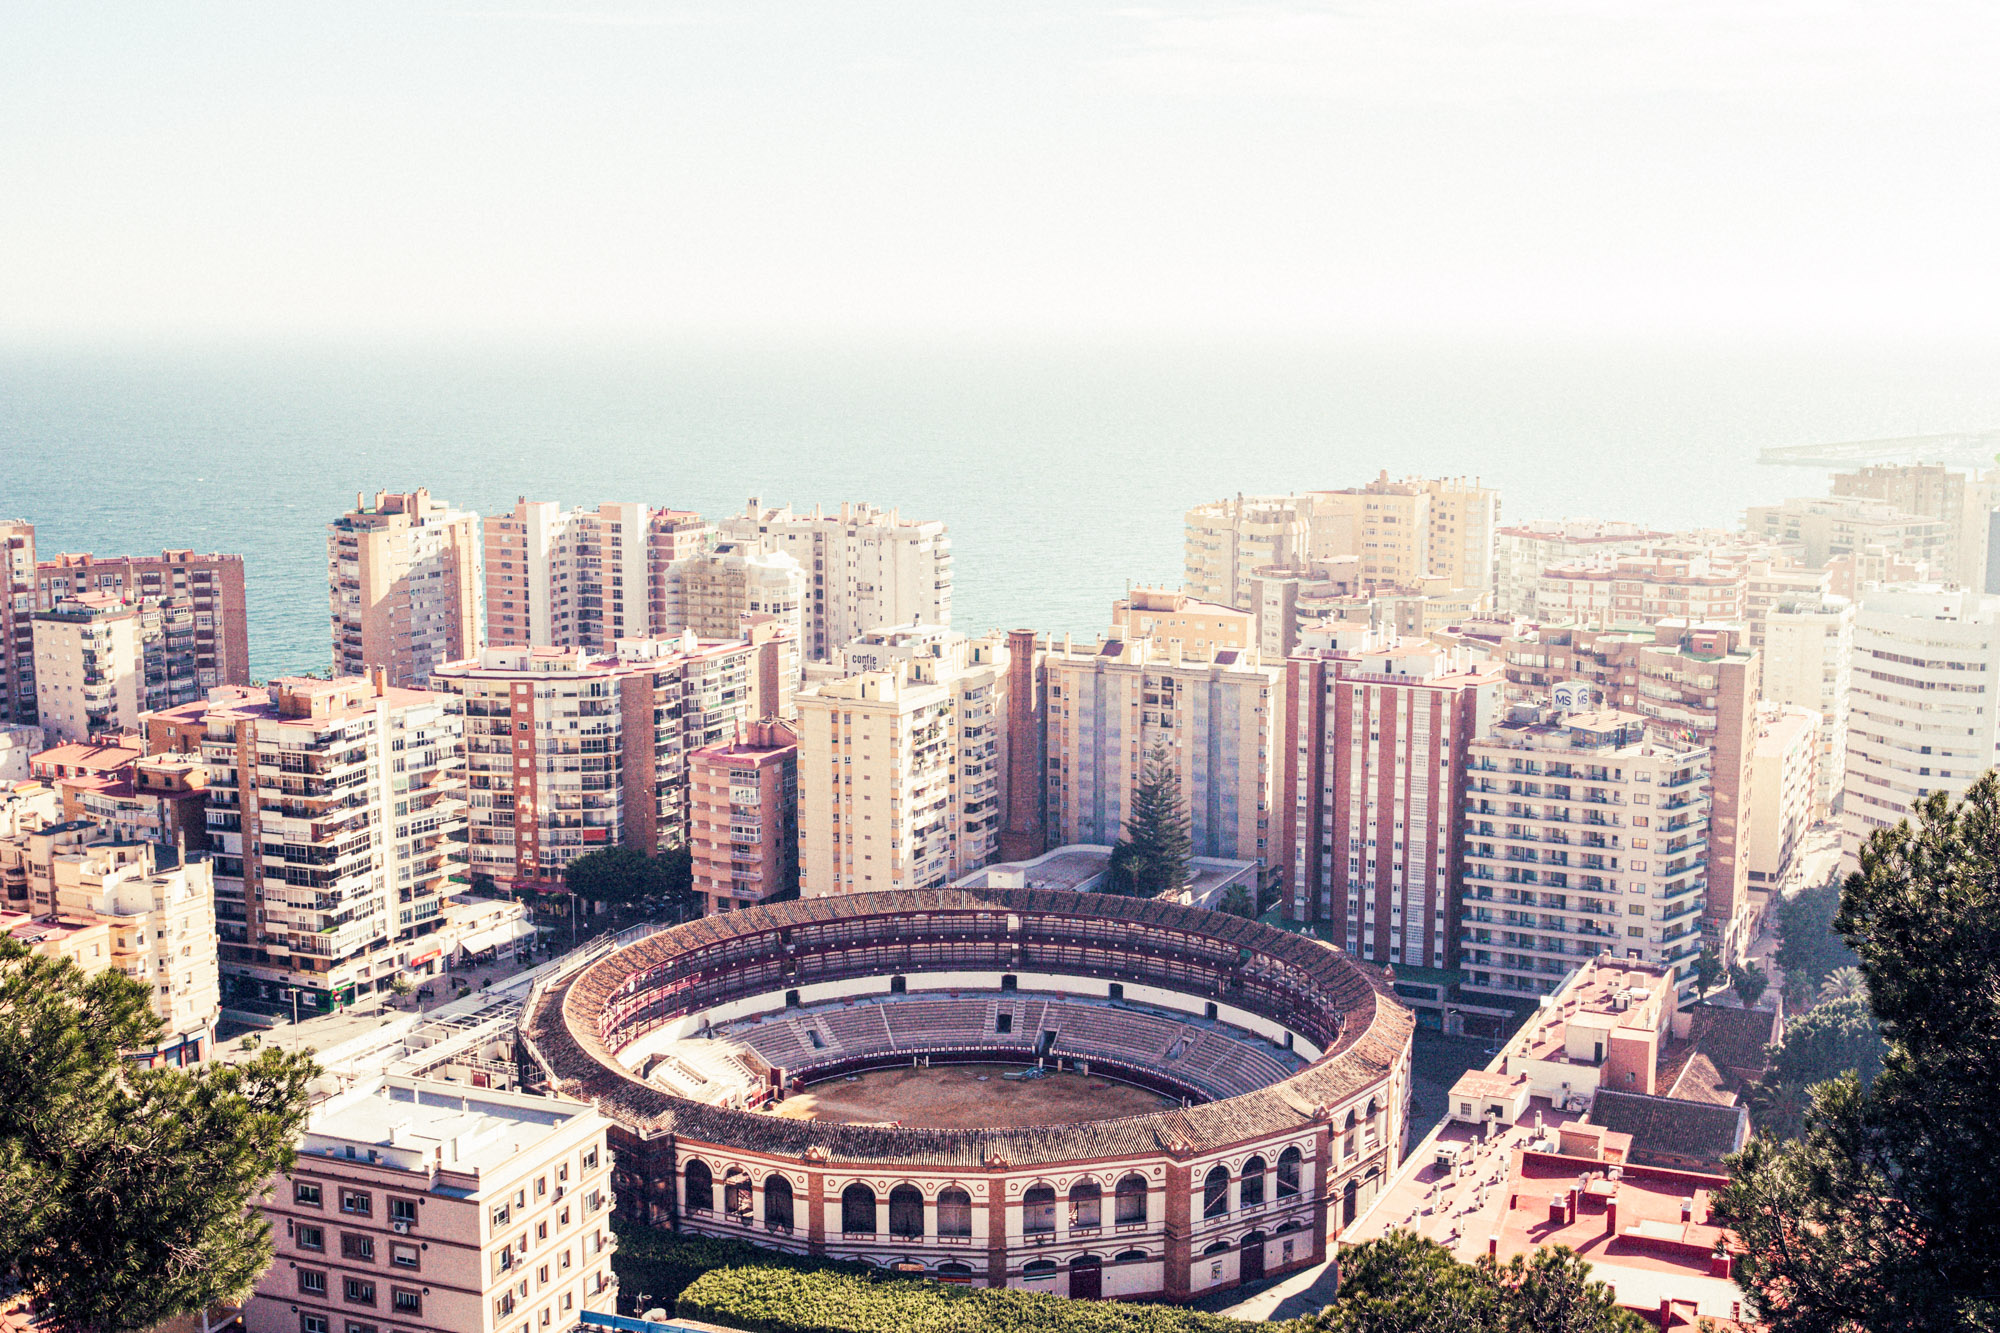 Malaga - Costa Del Sol - Espagne - Christian Möller - https://unsplash.com/photos/gO4Wi9srUv8